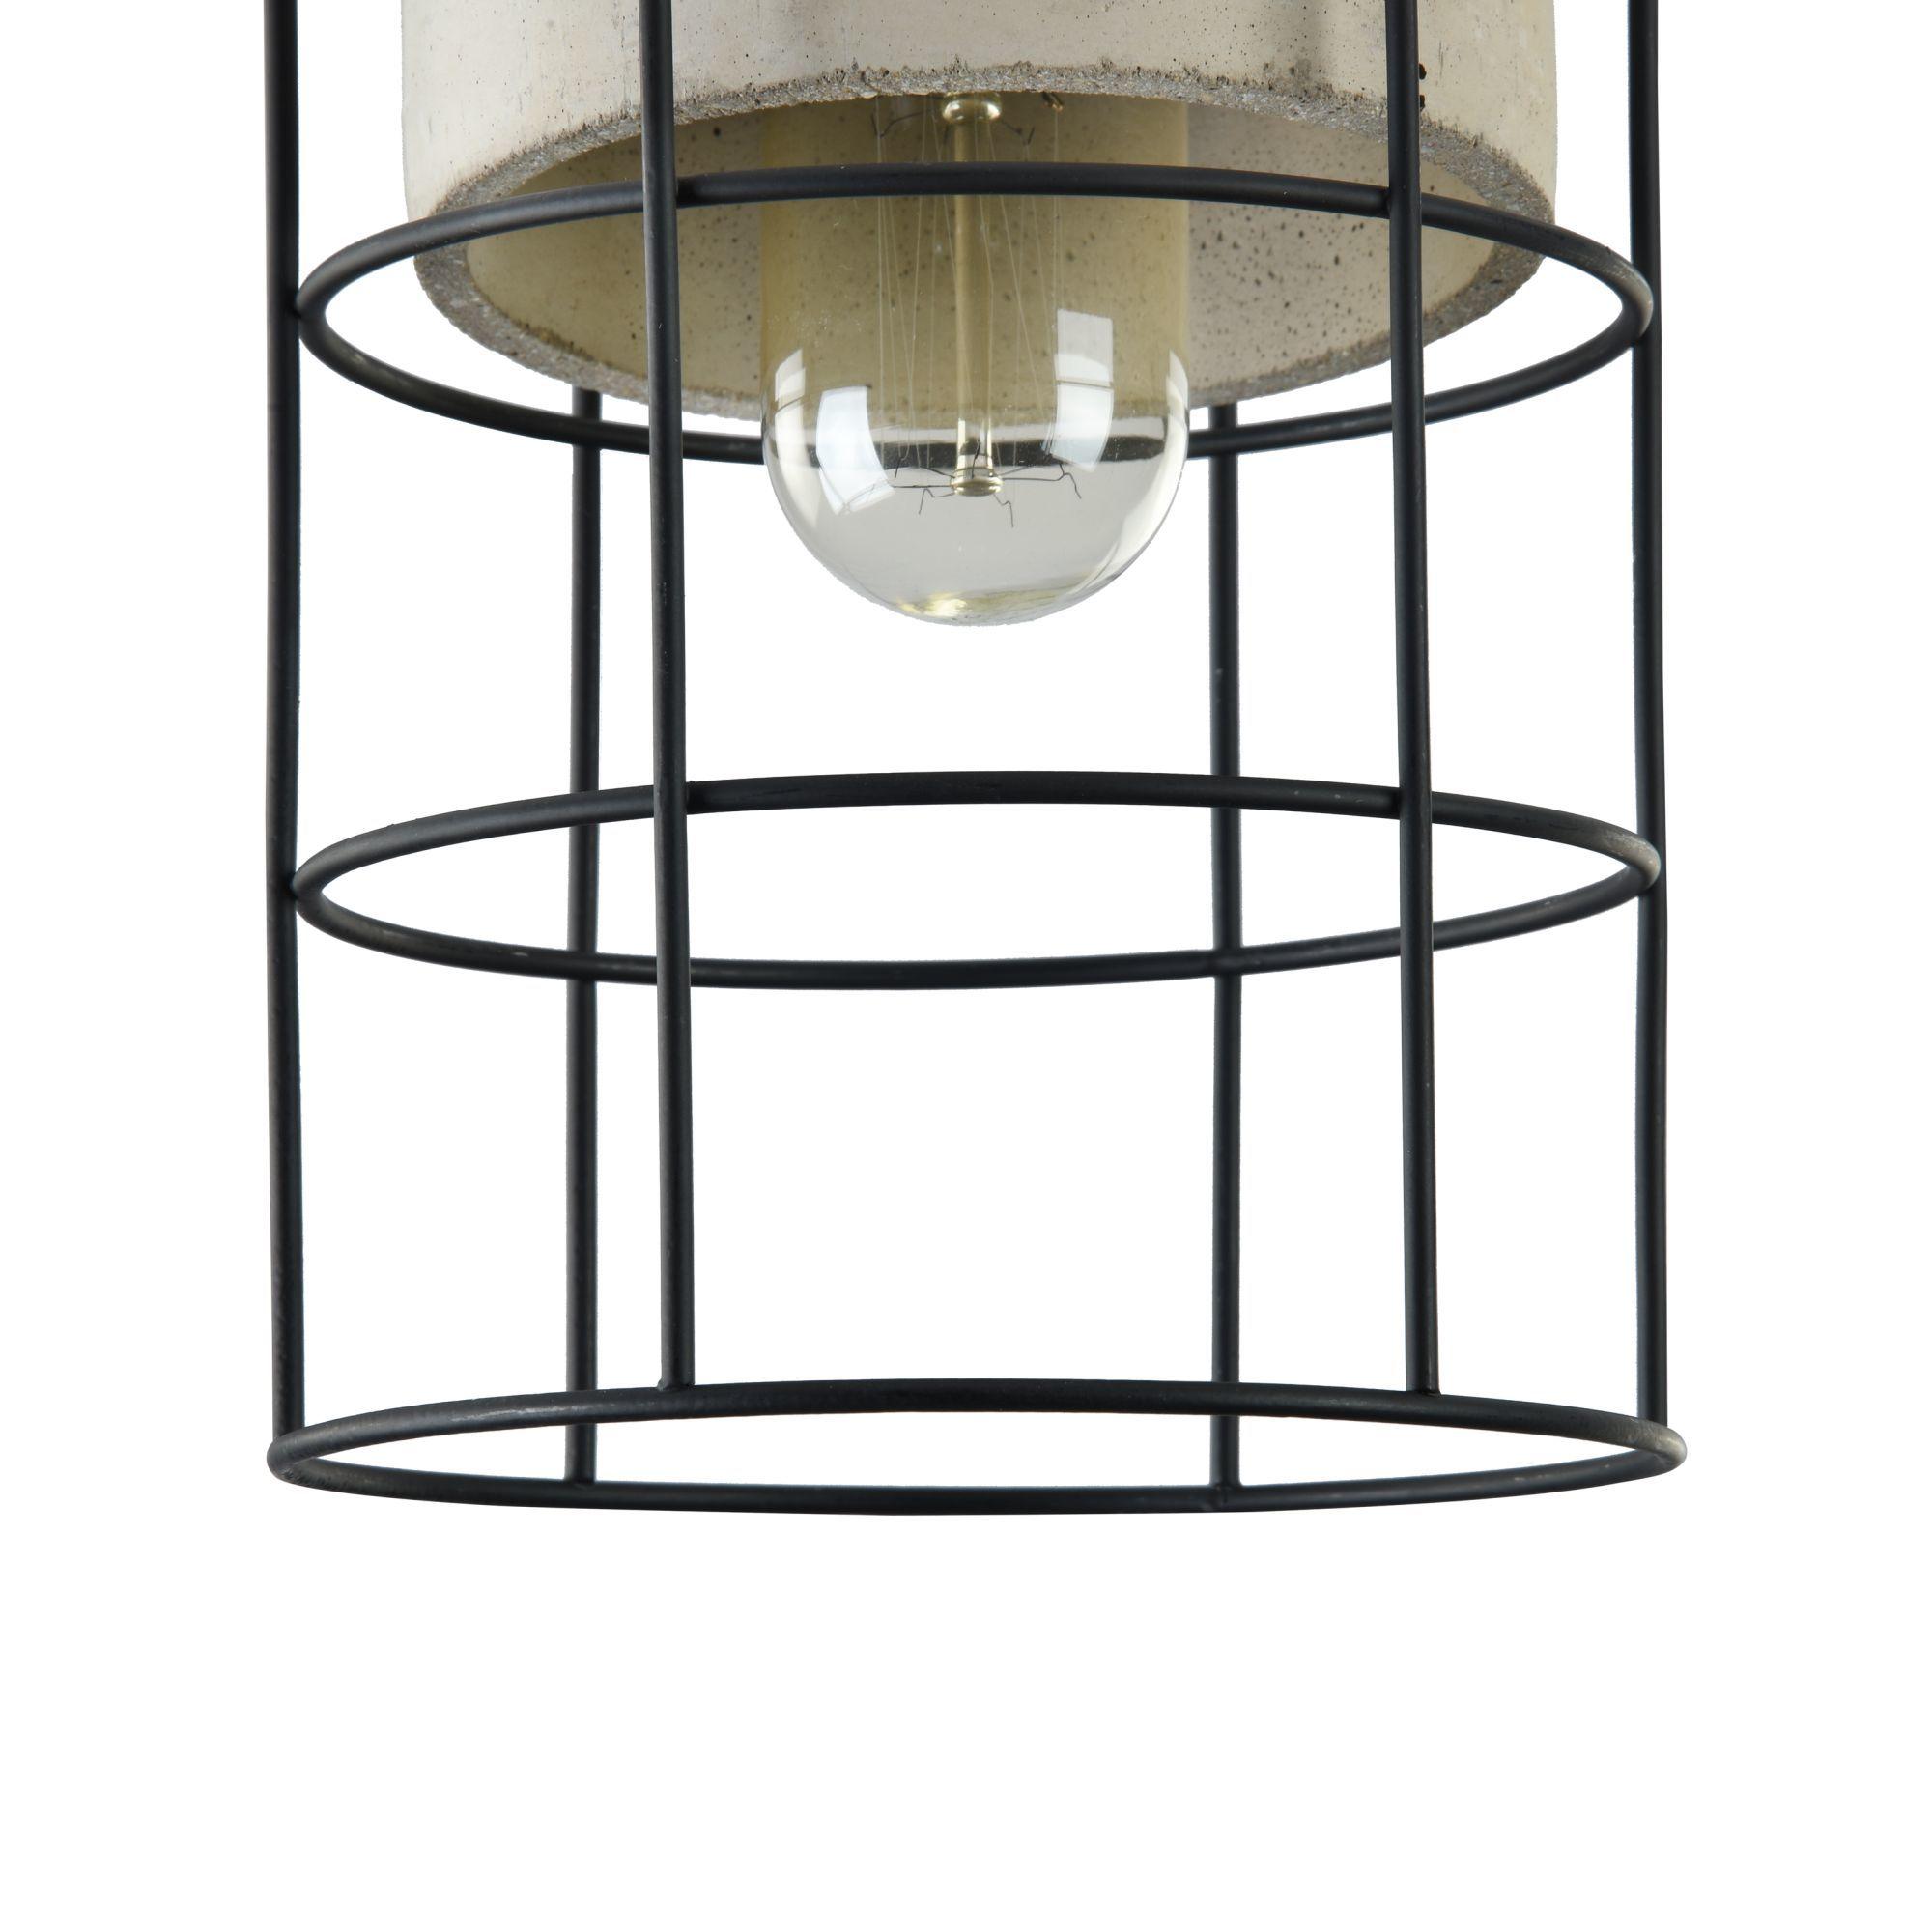 Подвесной светильник Maytoni Gosford T441-PL-01-GR, 1xE27x60W, черный, серый, металл, бетон - фото 7